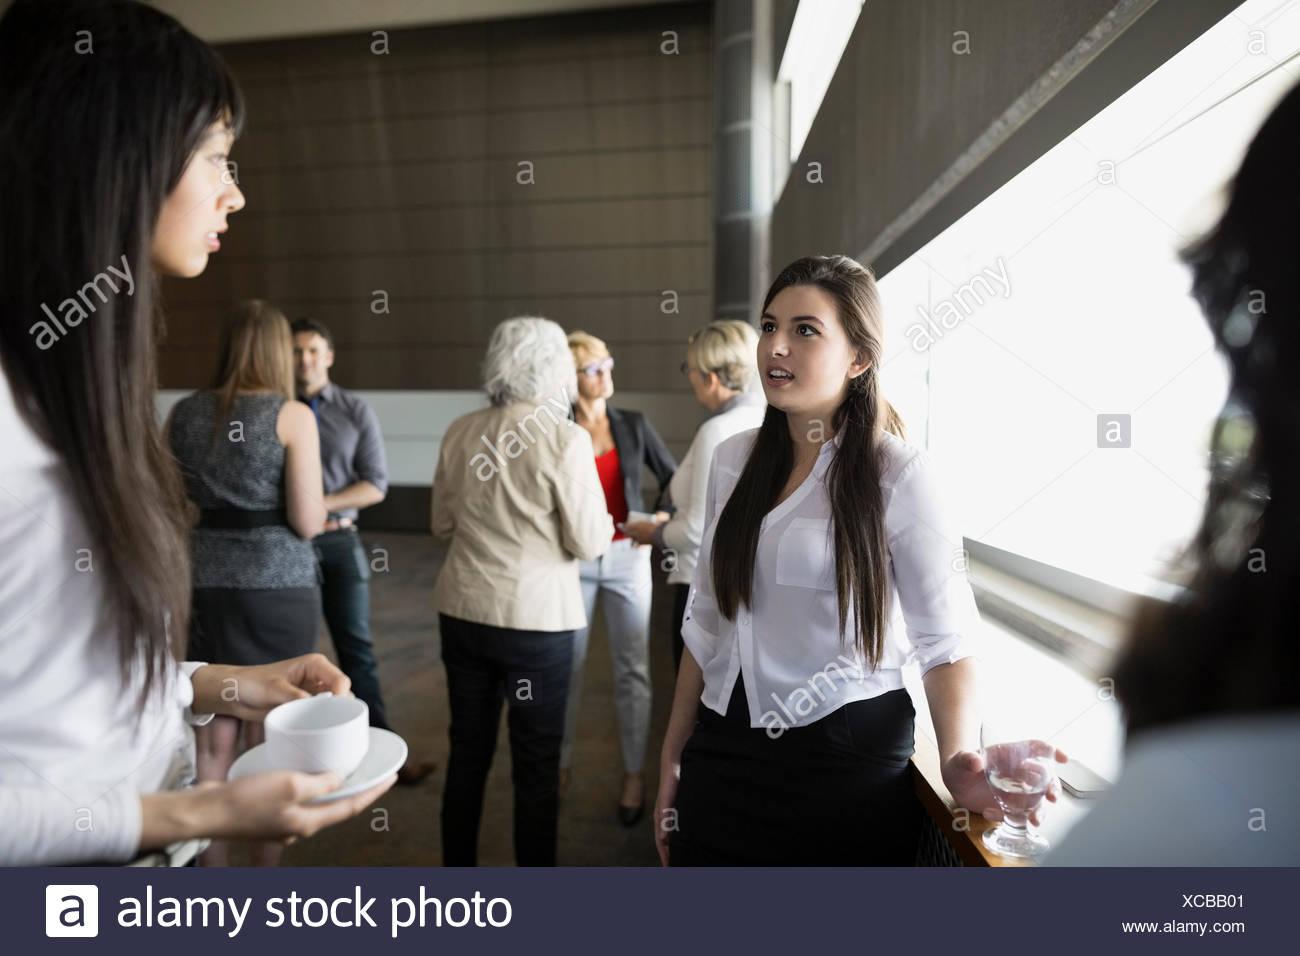 Women socializing in auditorium - Stock Image